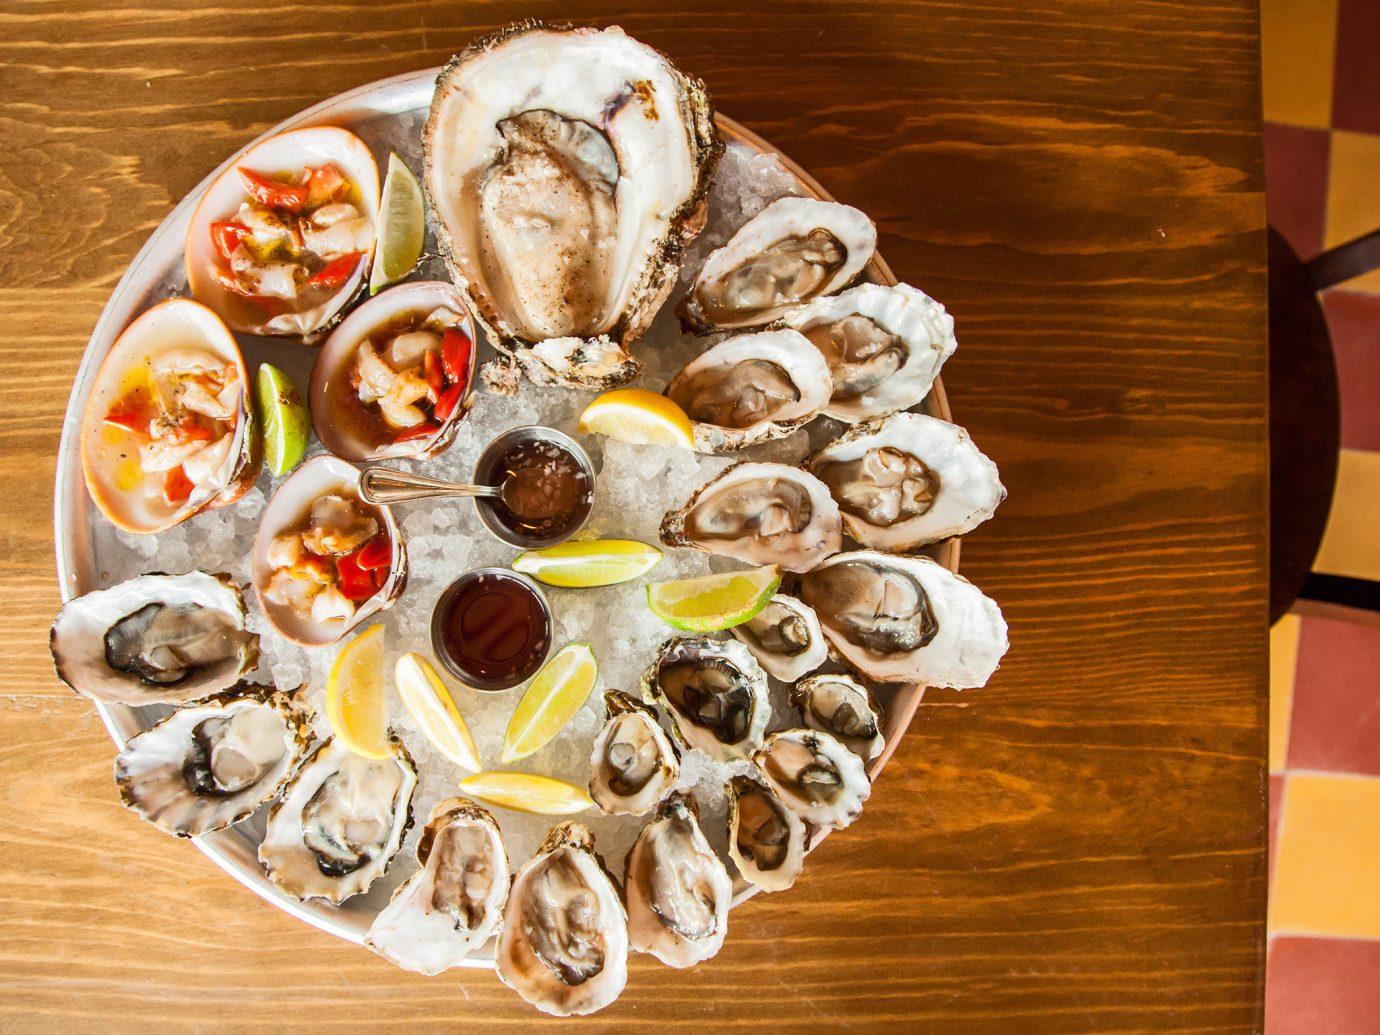 Trip Ideas table food indoor dish plate meal wooden Seafood cuisine produce dessert sliced